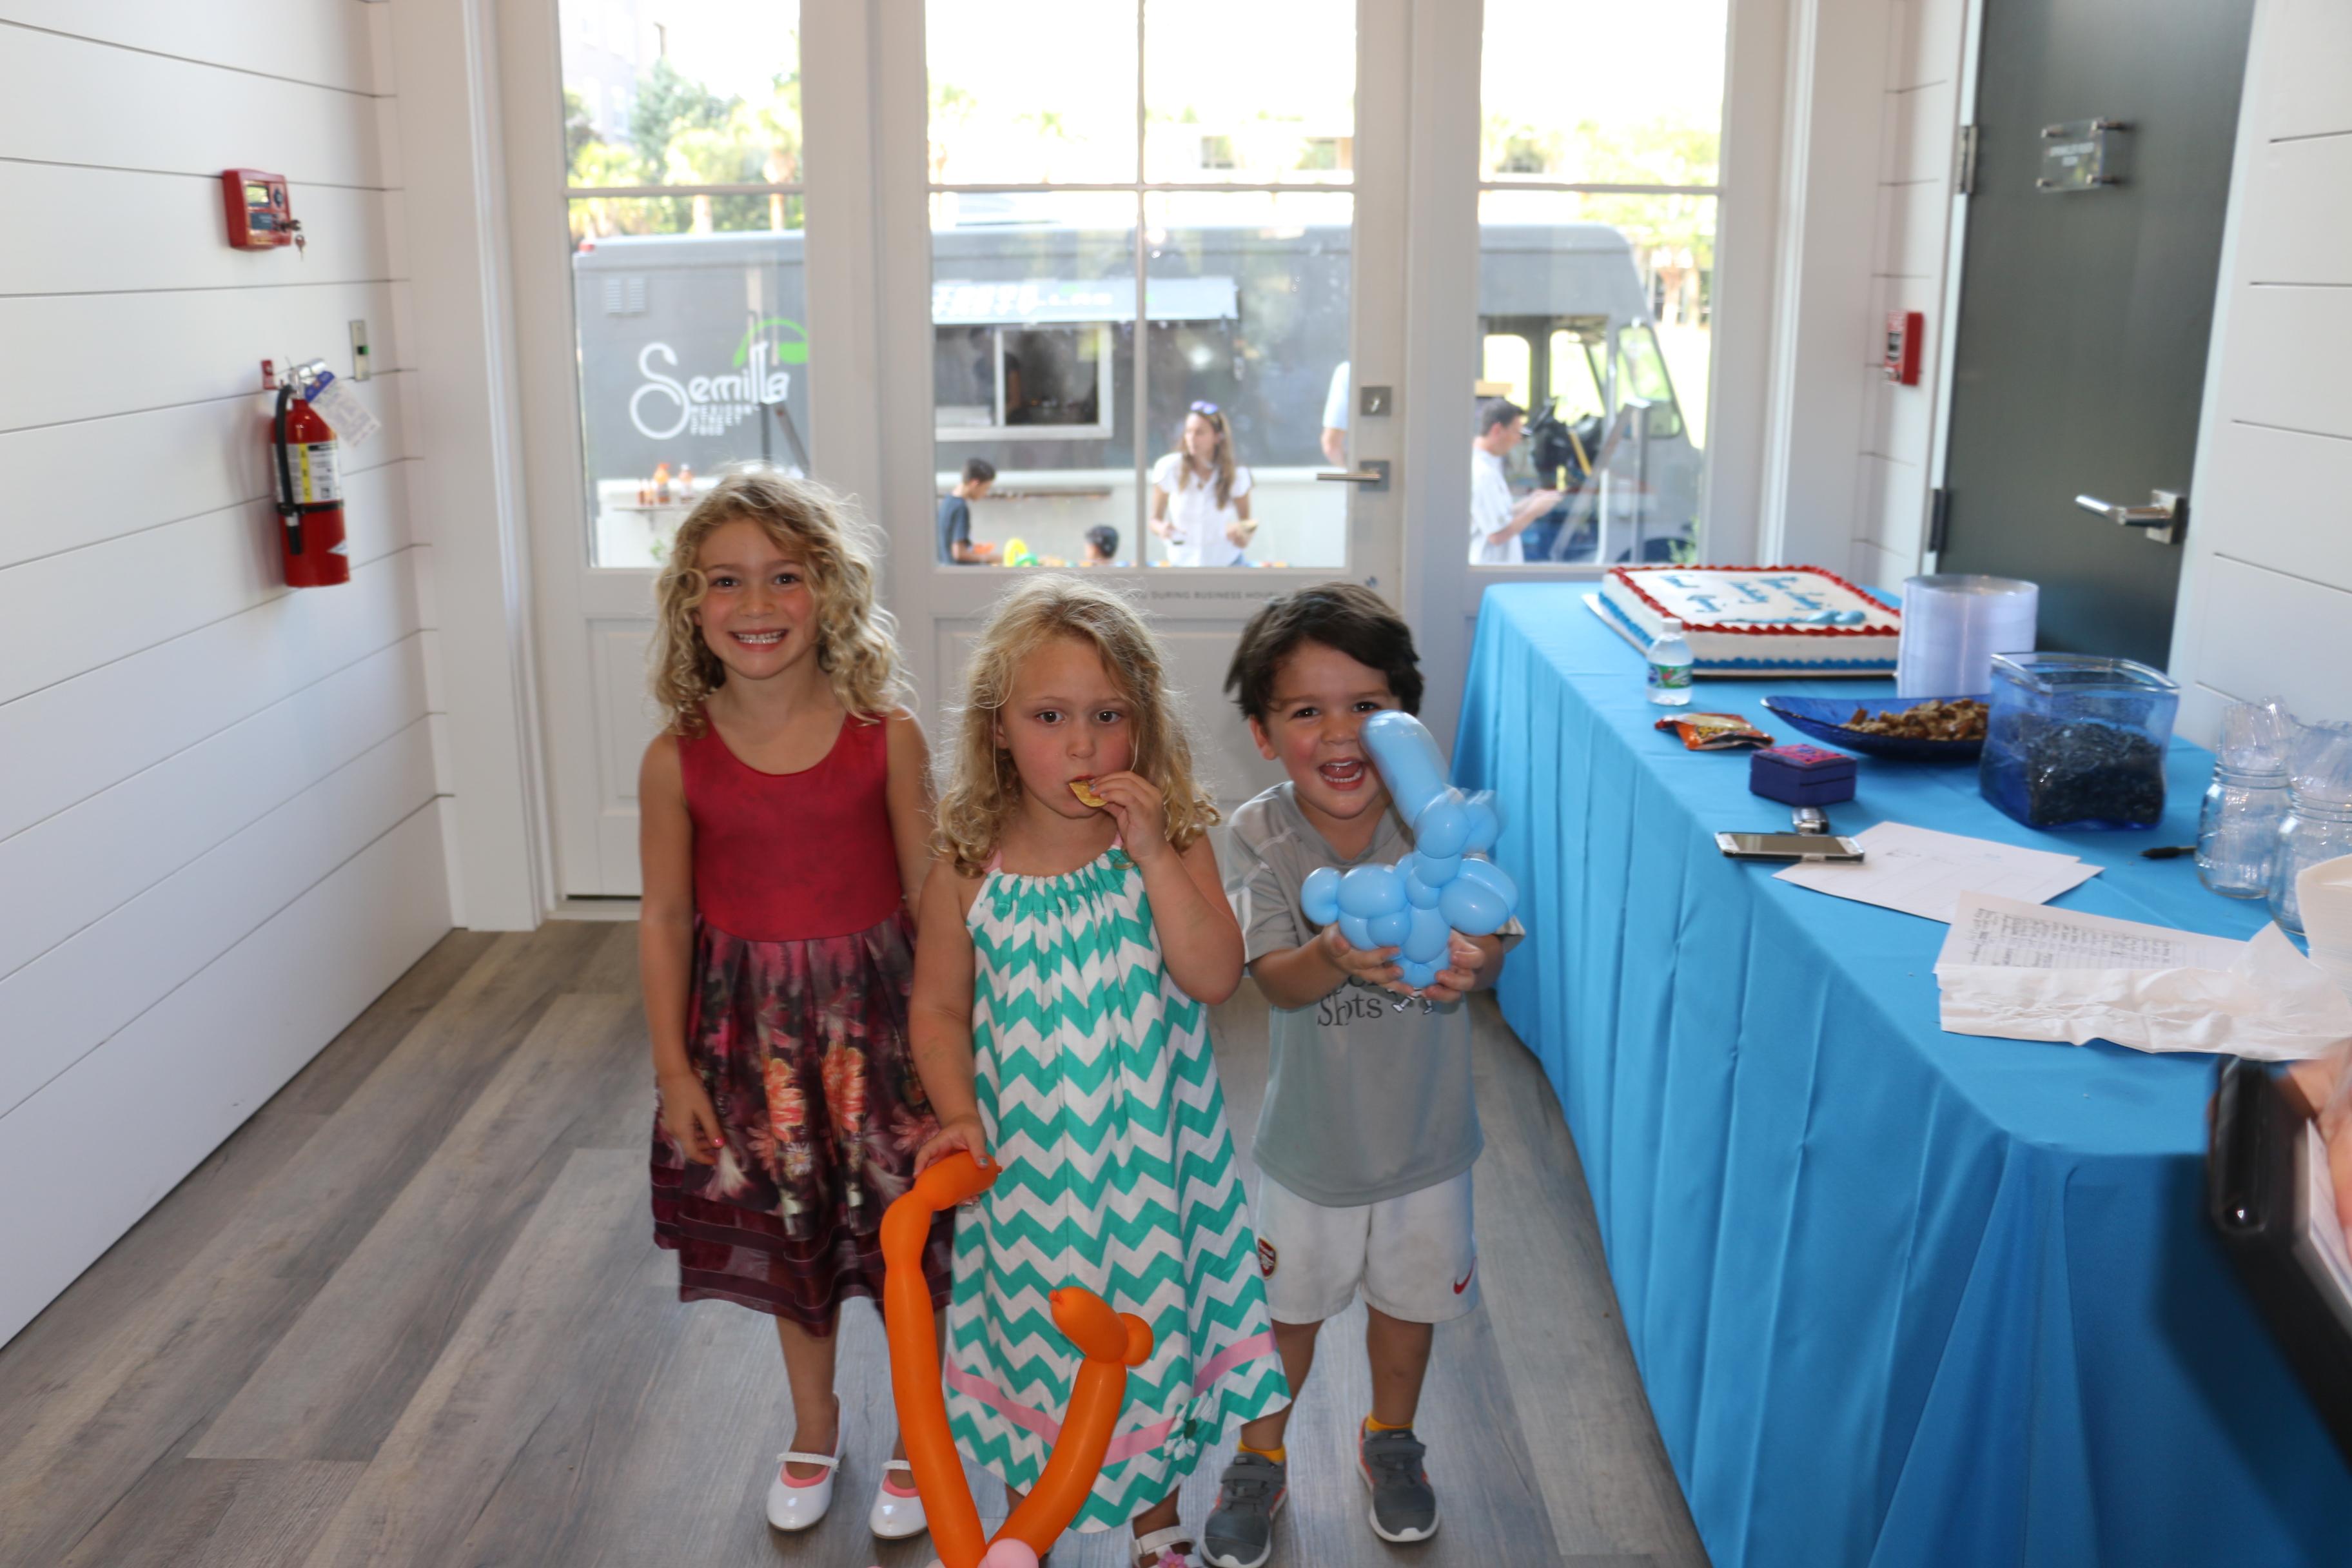 Maddie Zechmann, Kate Zechmann, and friend Grant Williams anxiously wait for the cake cutting.